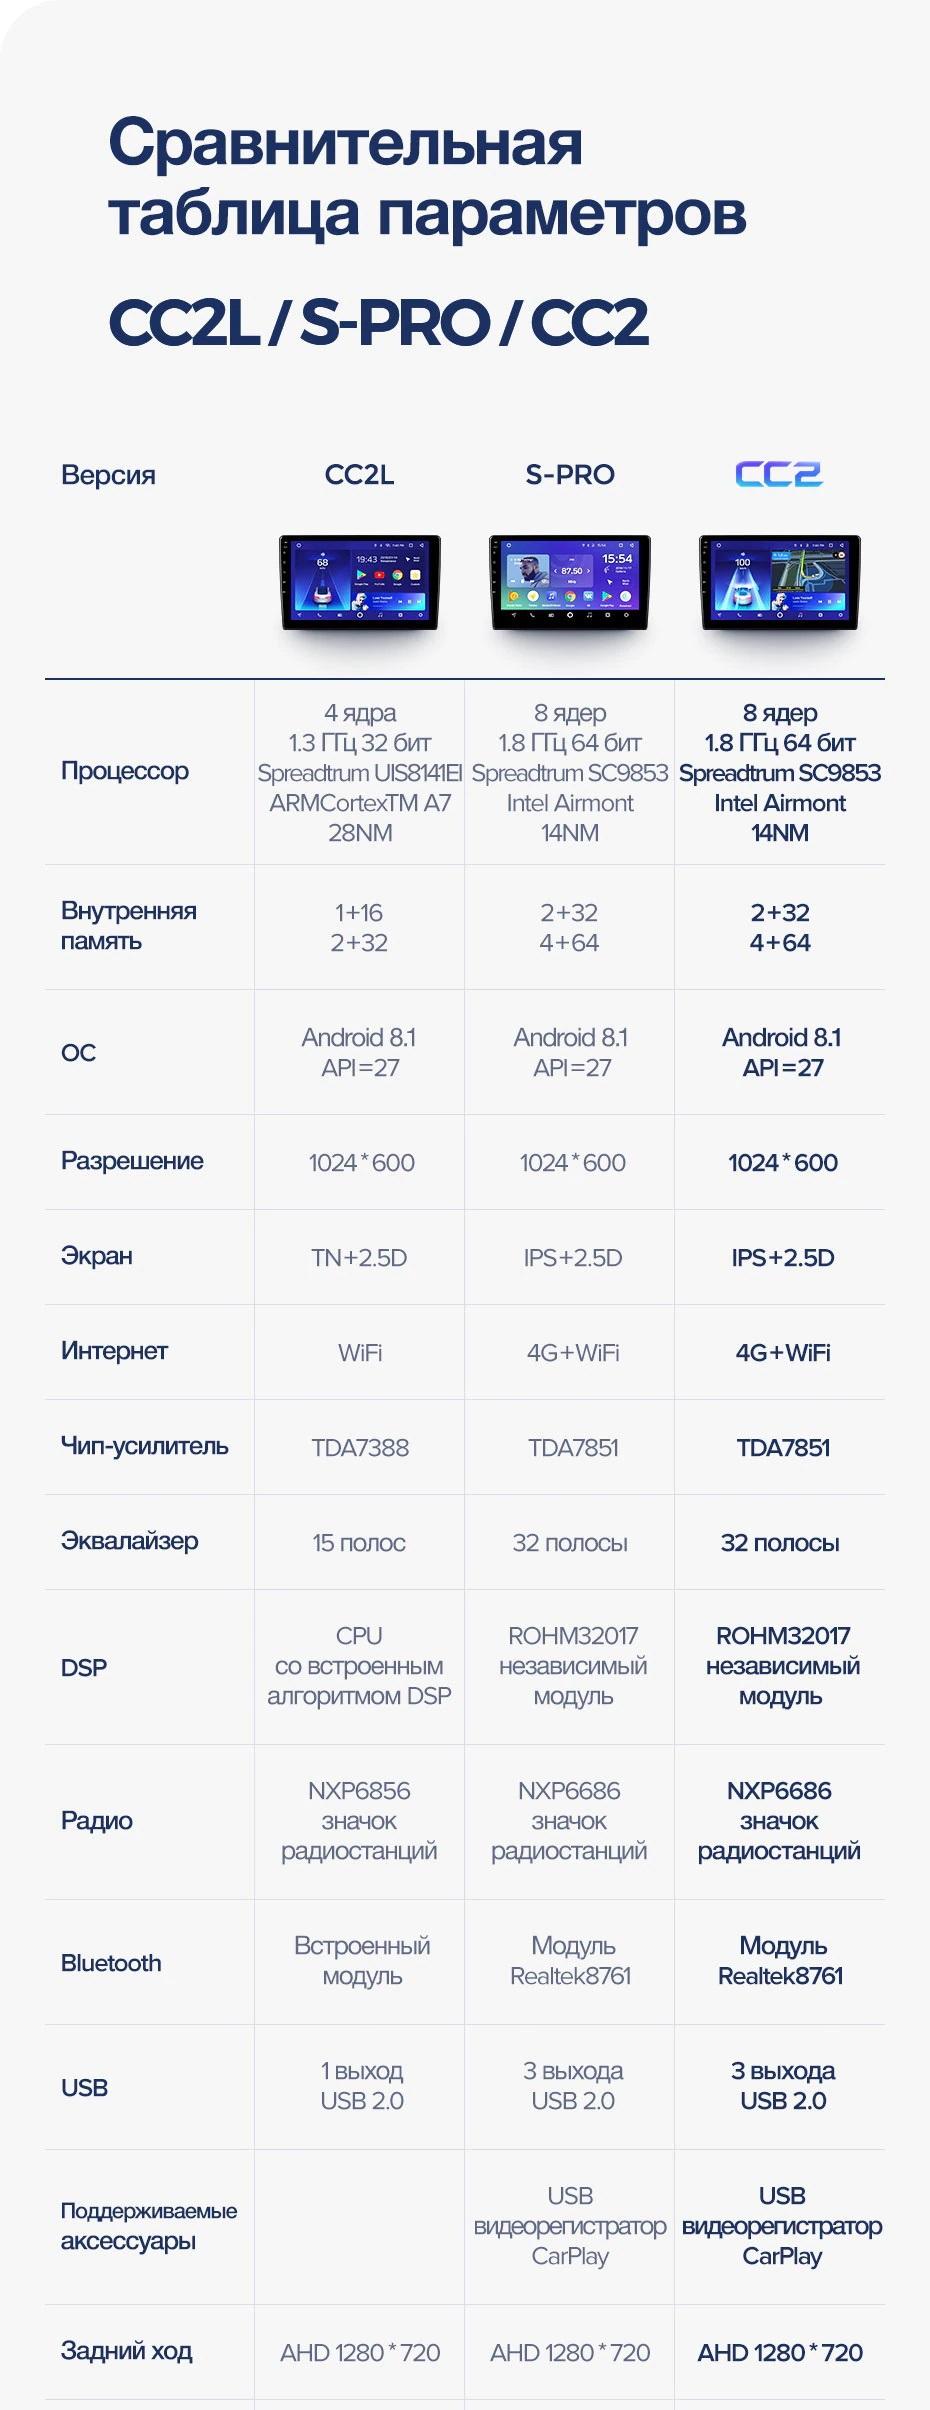 https://autoaura.ru/images/upload/stat1.jpg